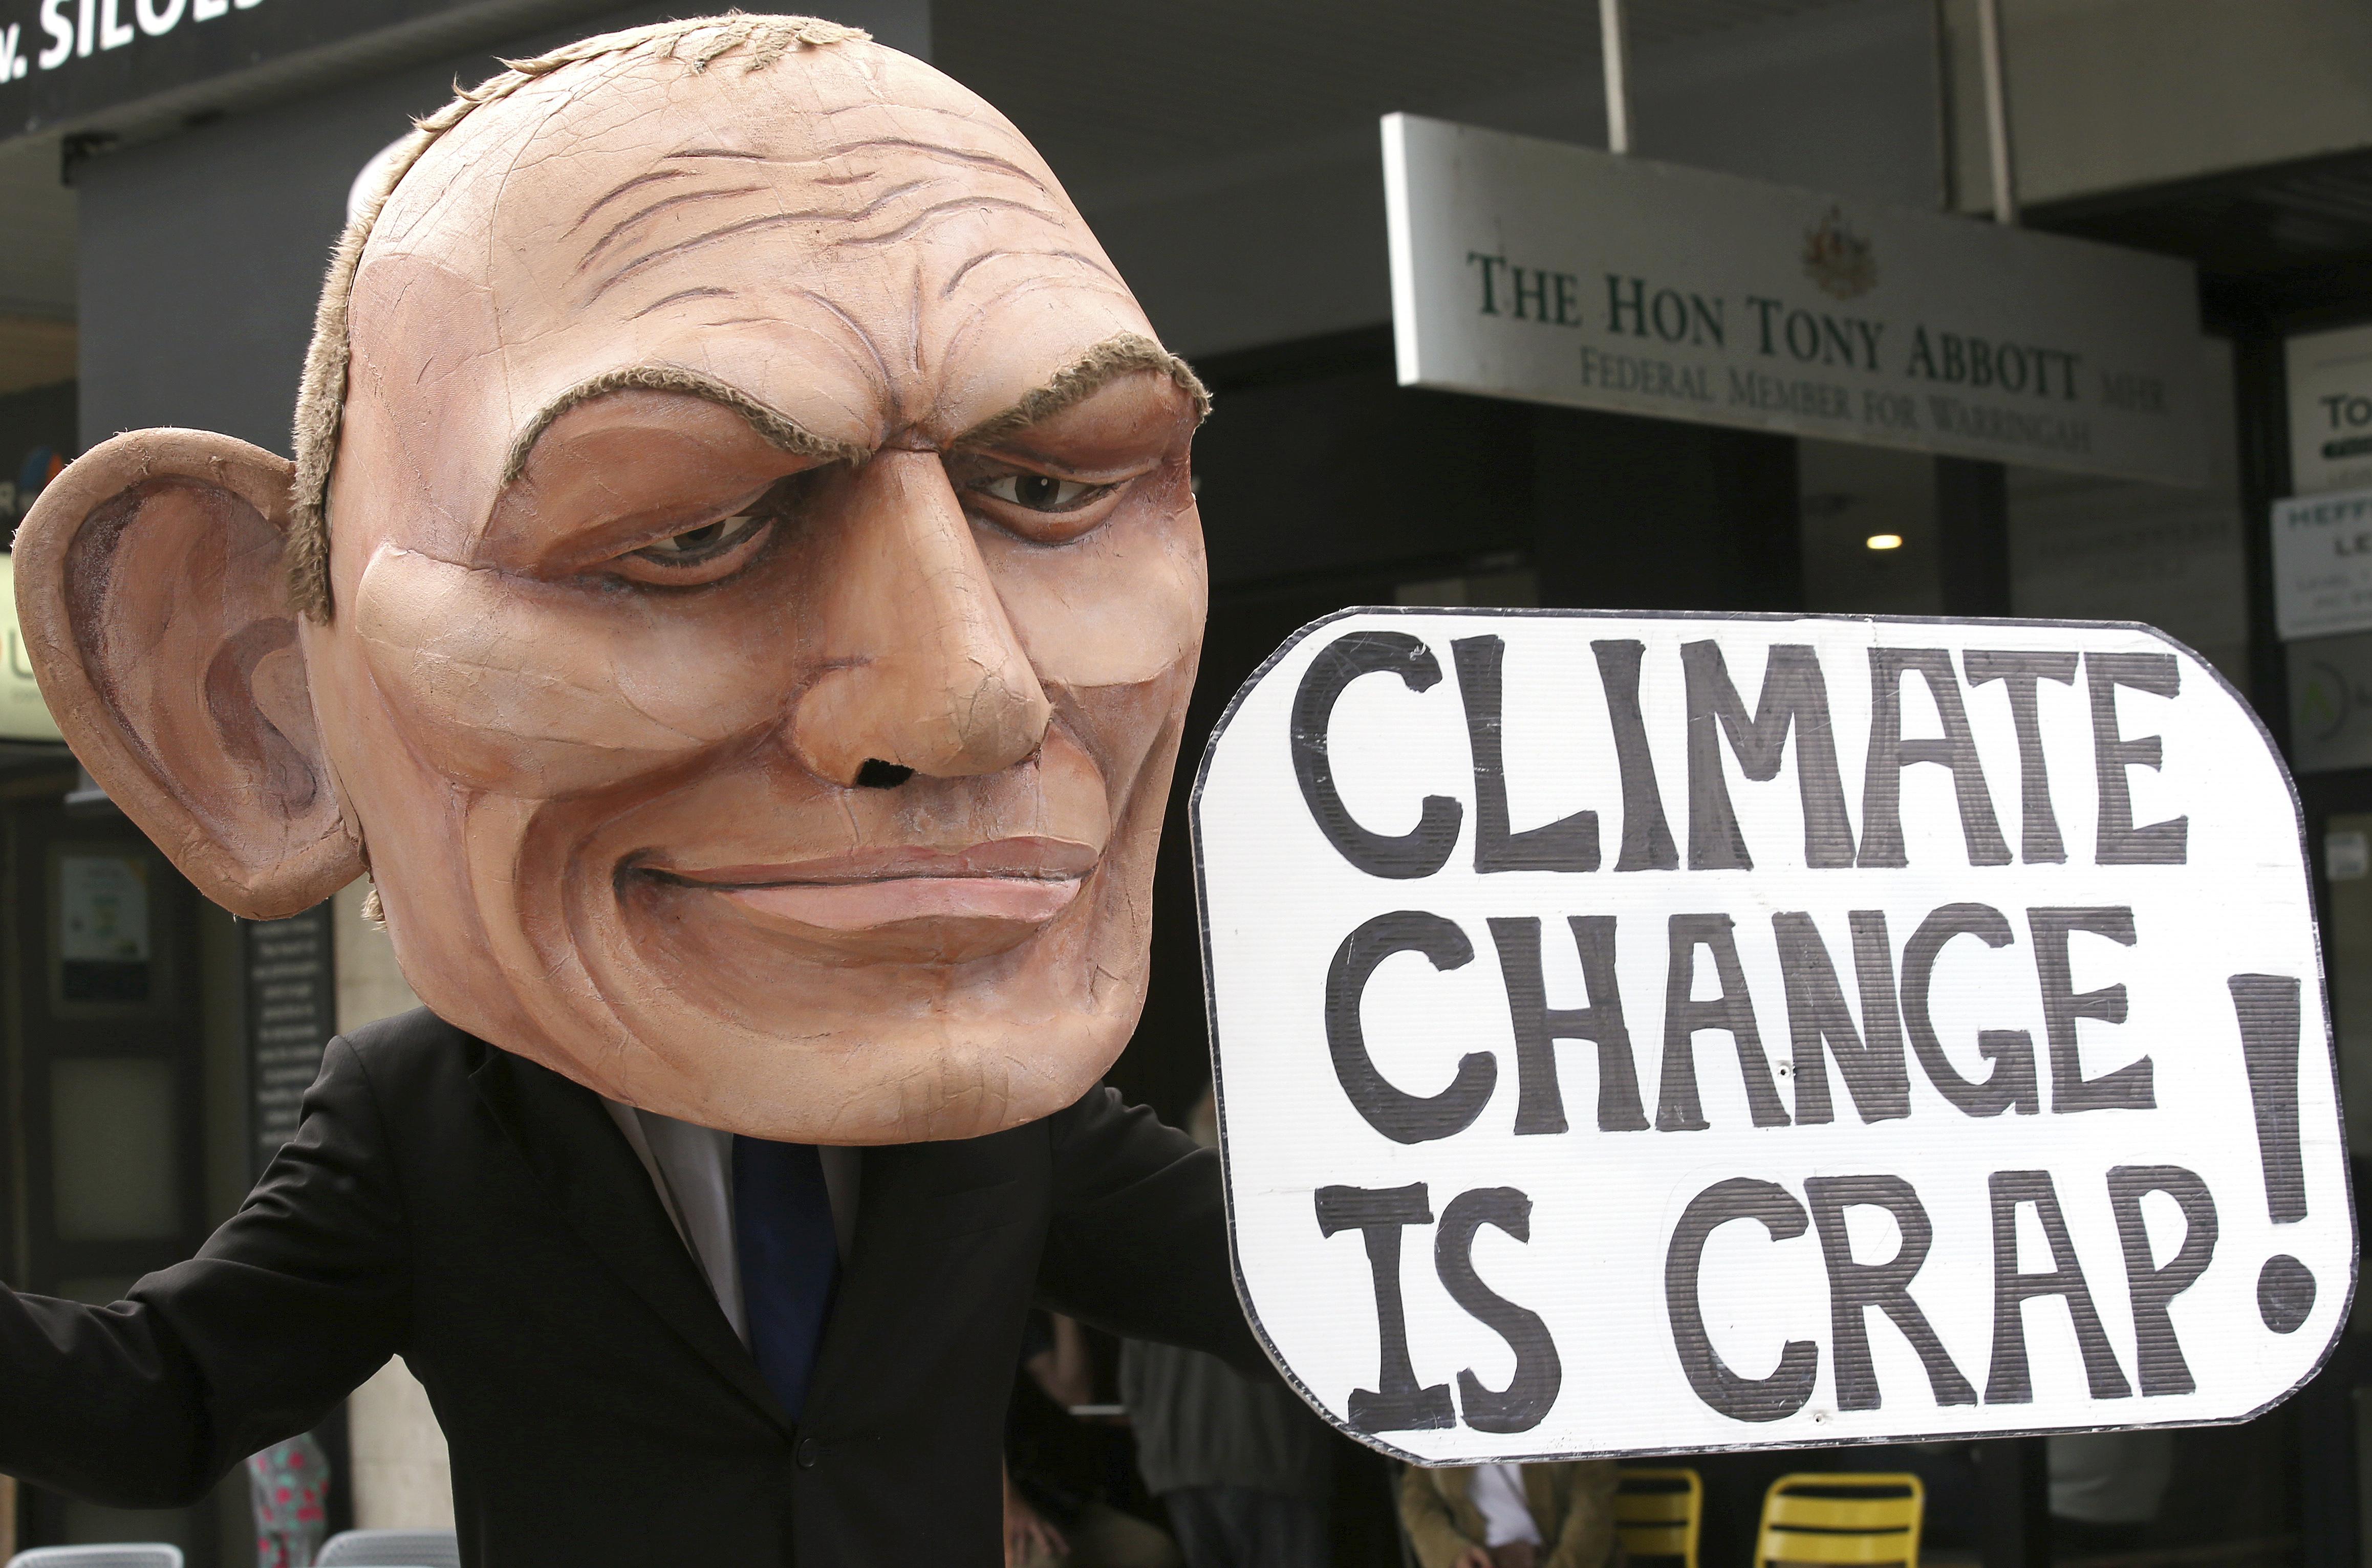 Protestor outside Mr Abbott's office. Credit: PA